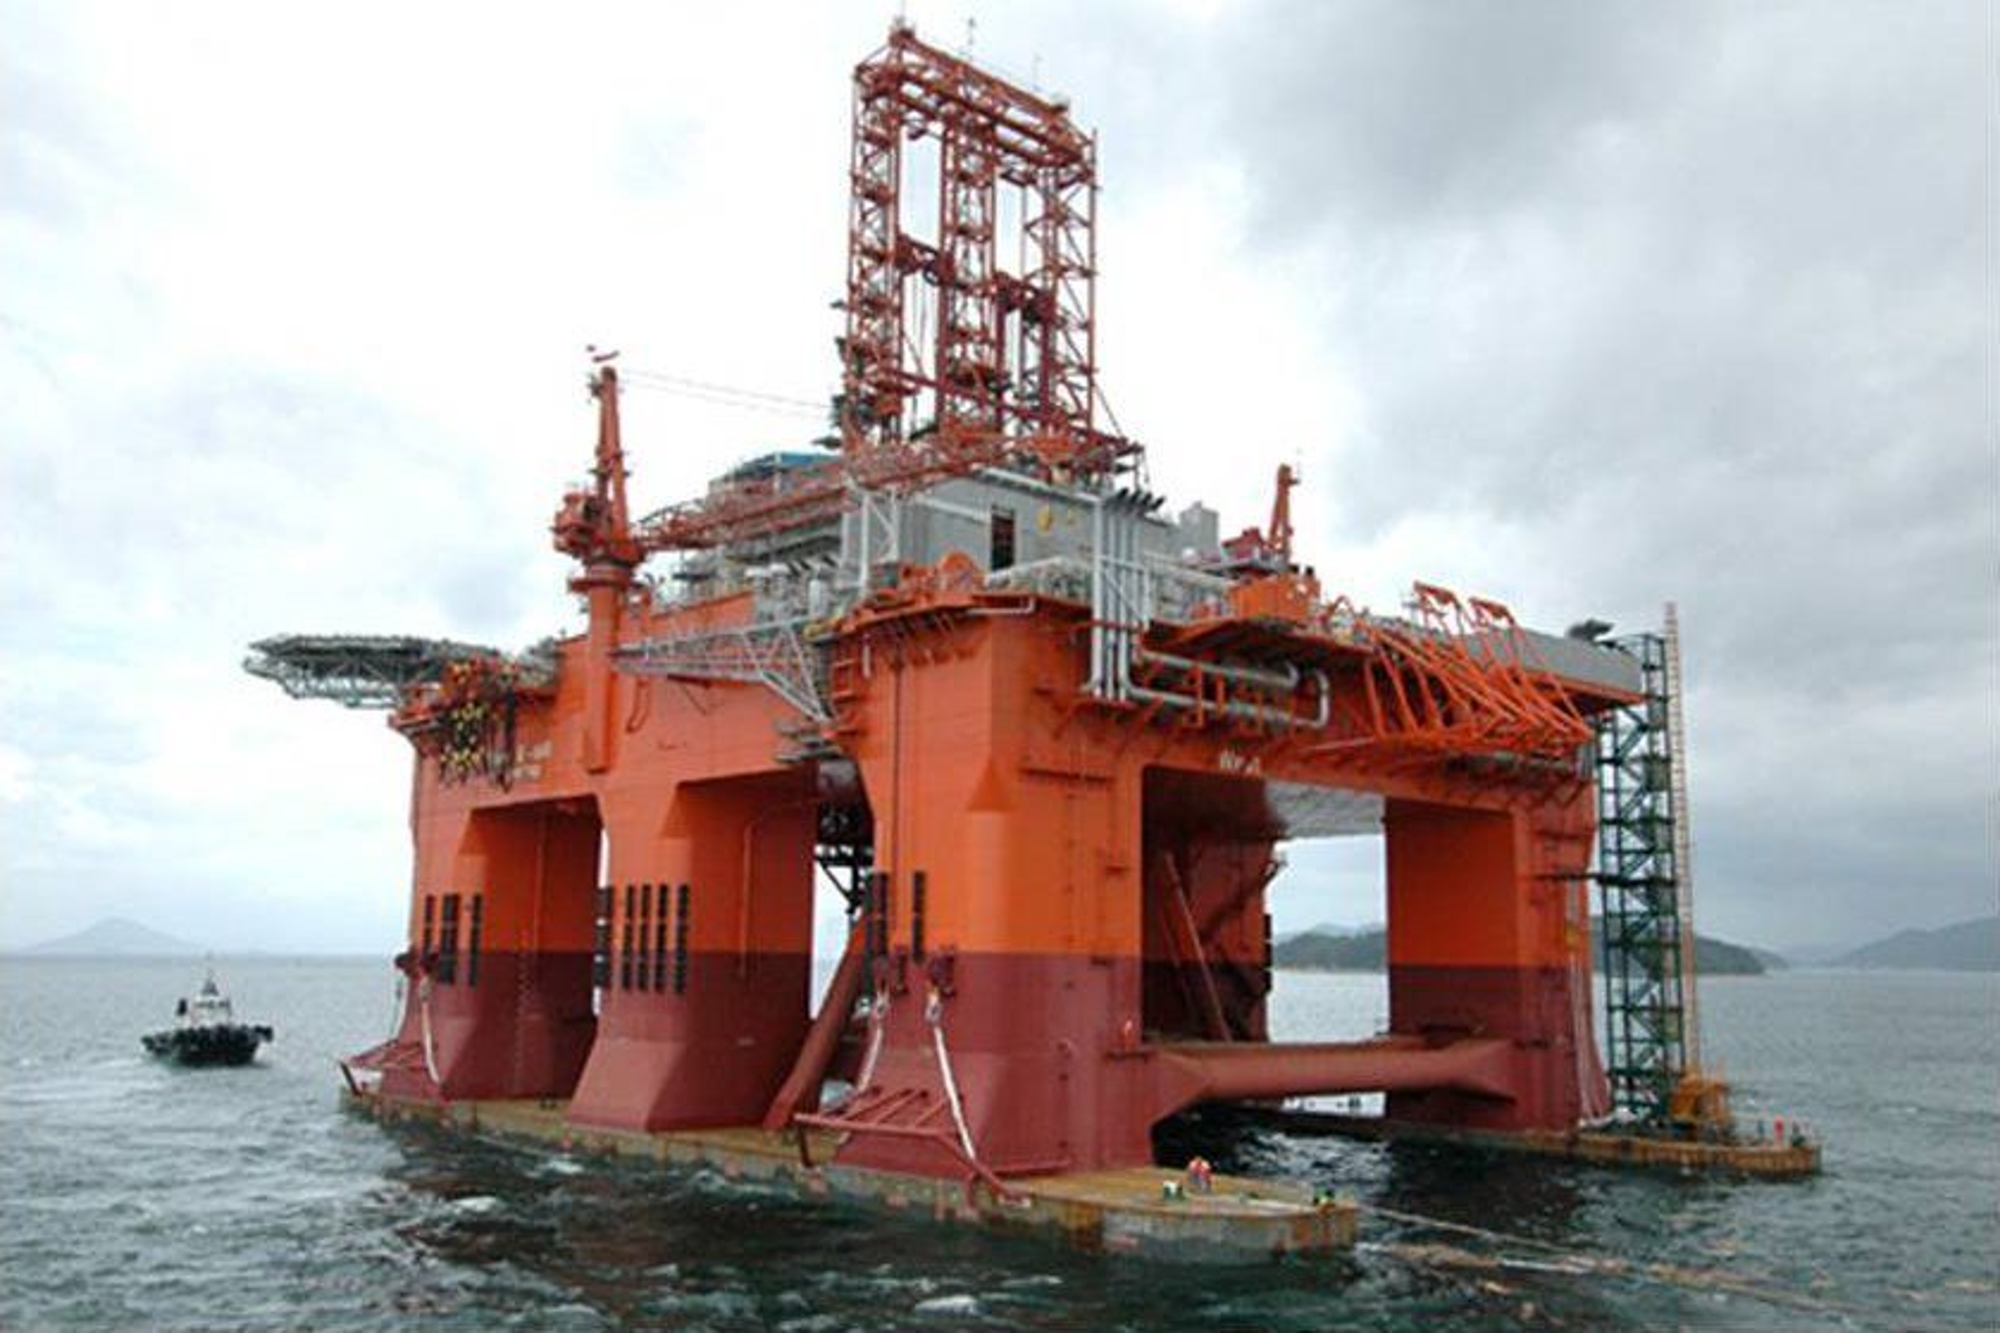 West Phoenix har gjort et gassfunn i Barentshavet.